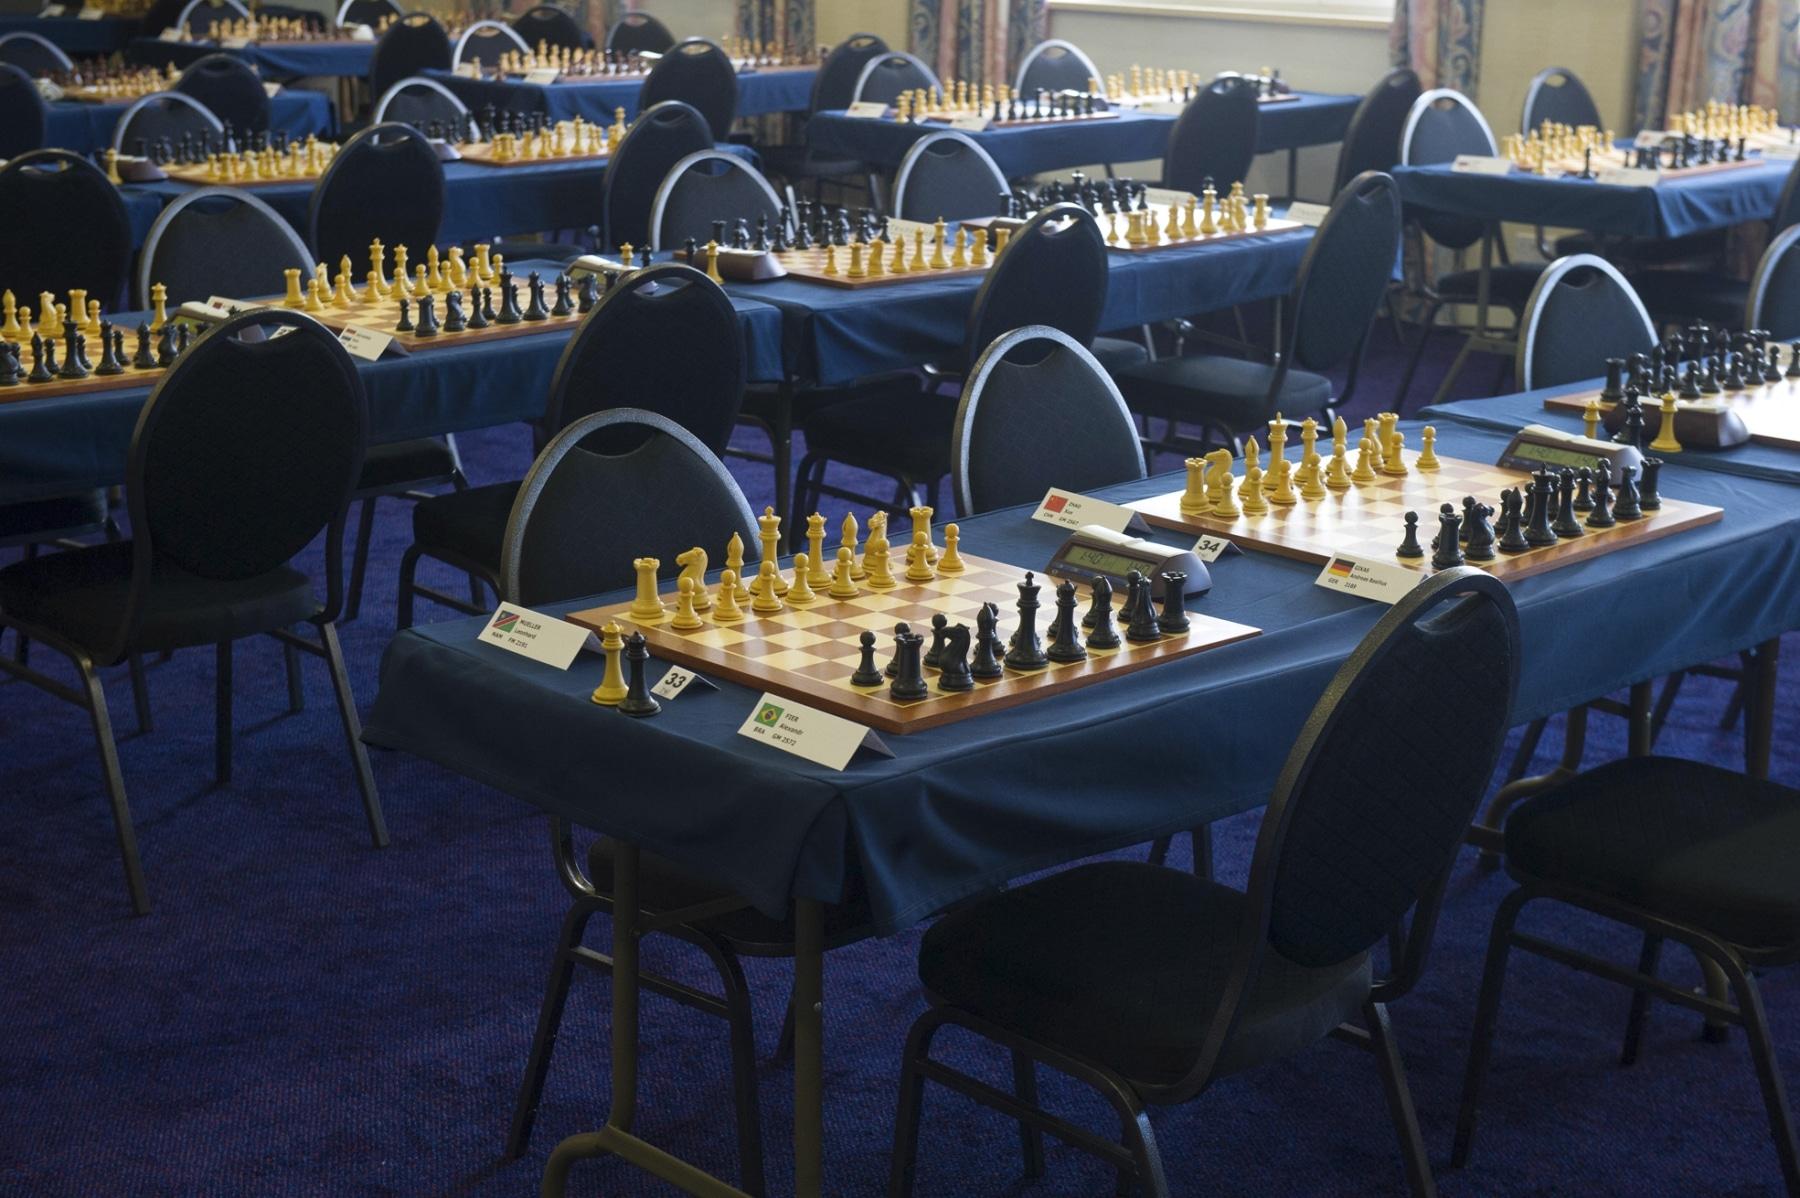 gibraltar-tradewise-chess-festival_001_12193311105_o